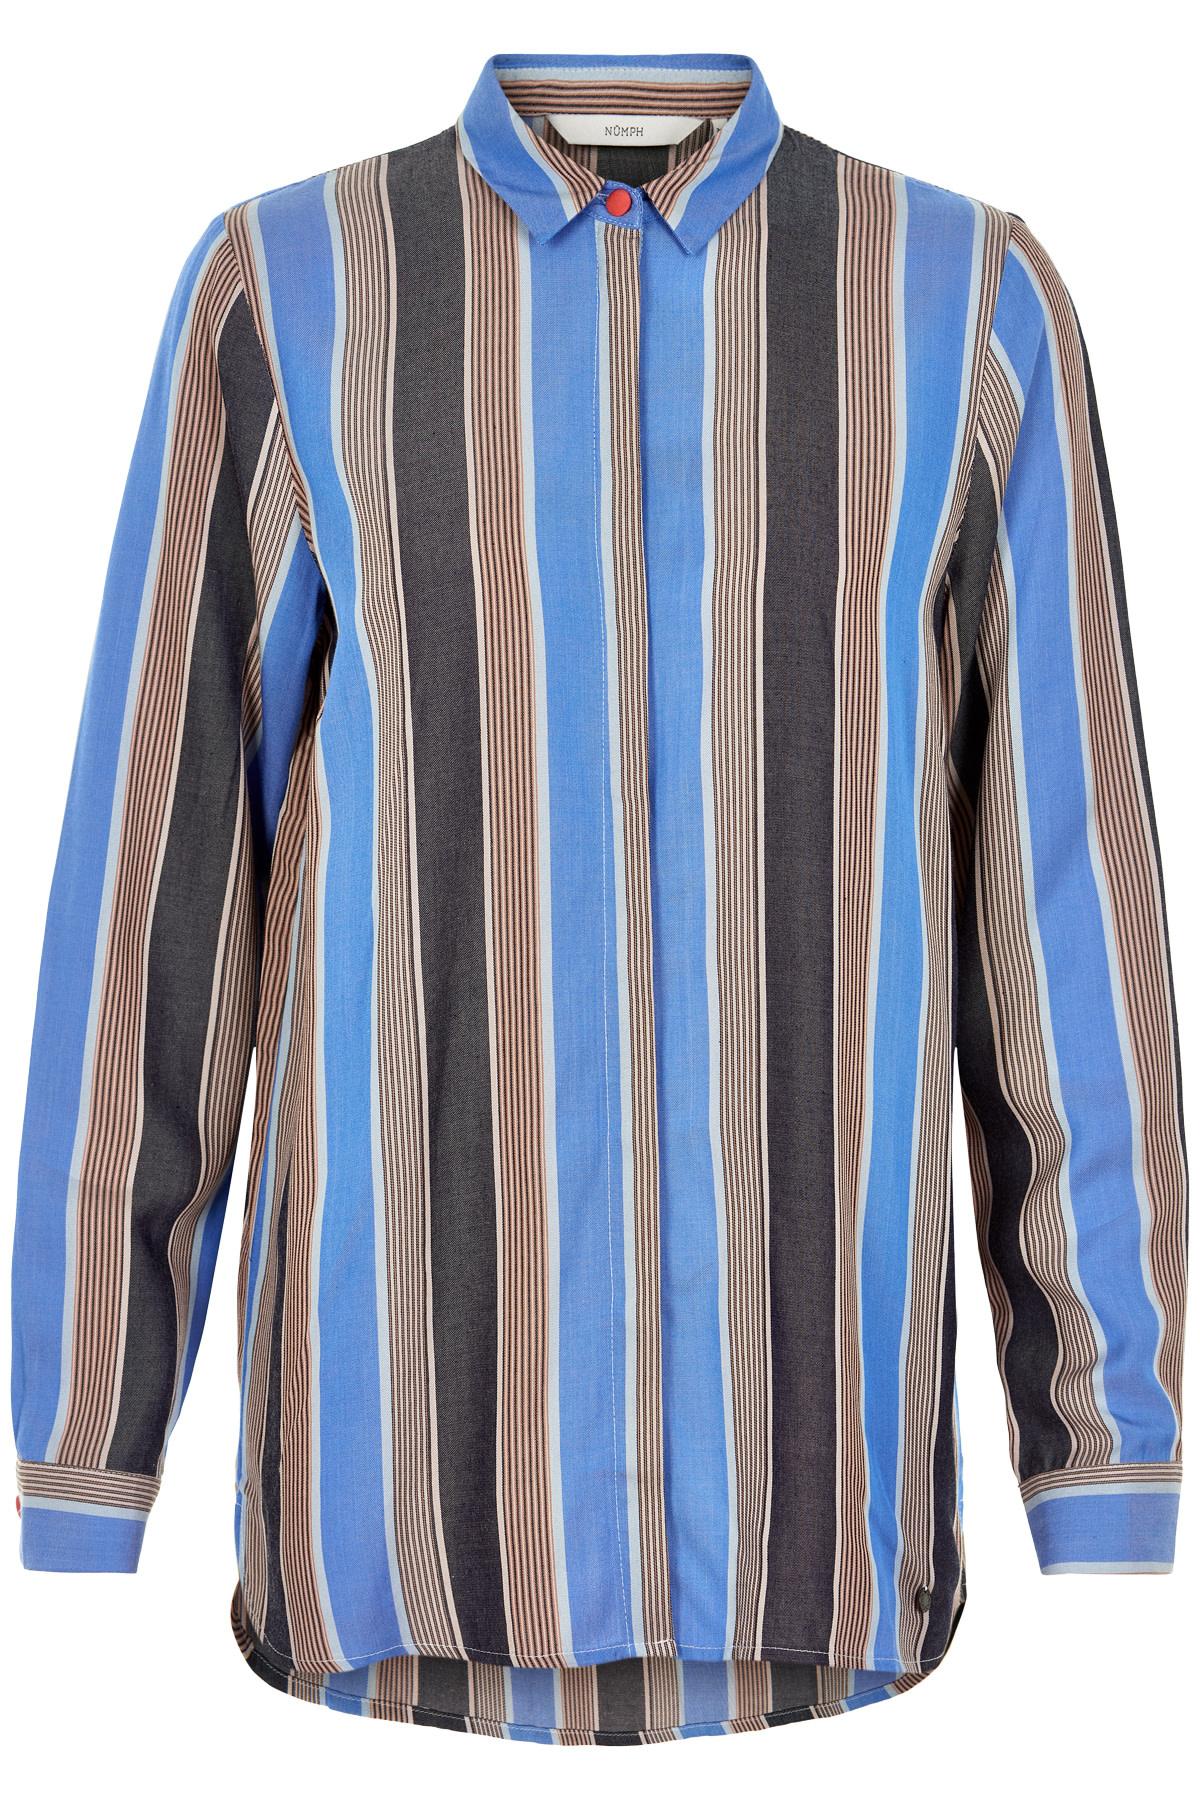 Nümph Jennet Shirt